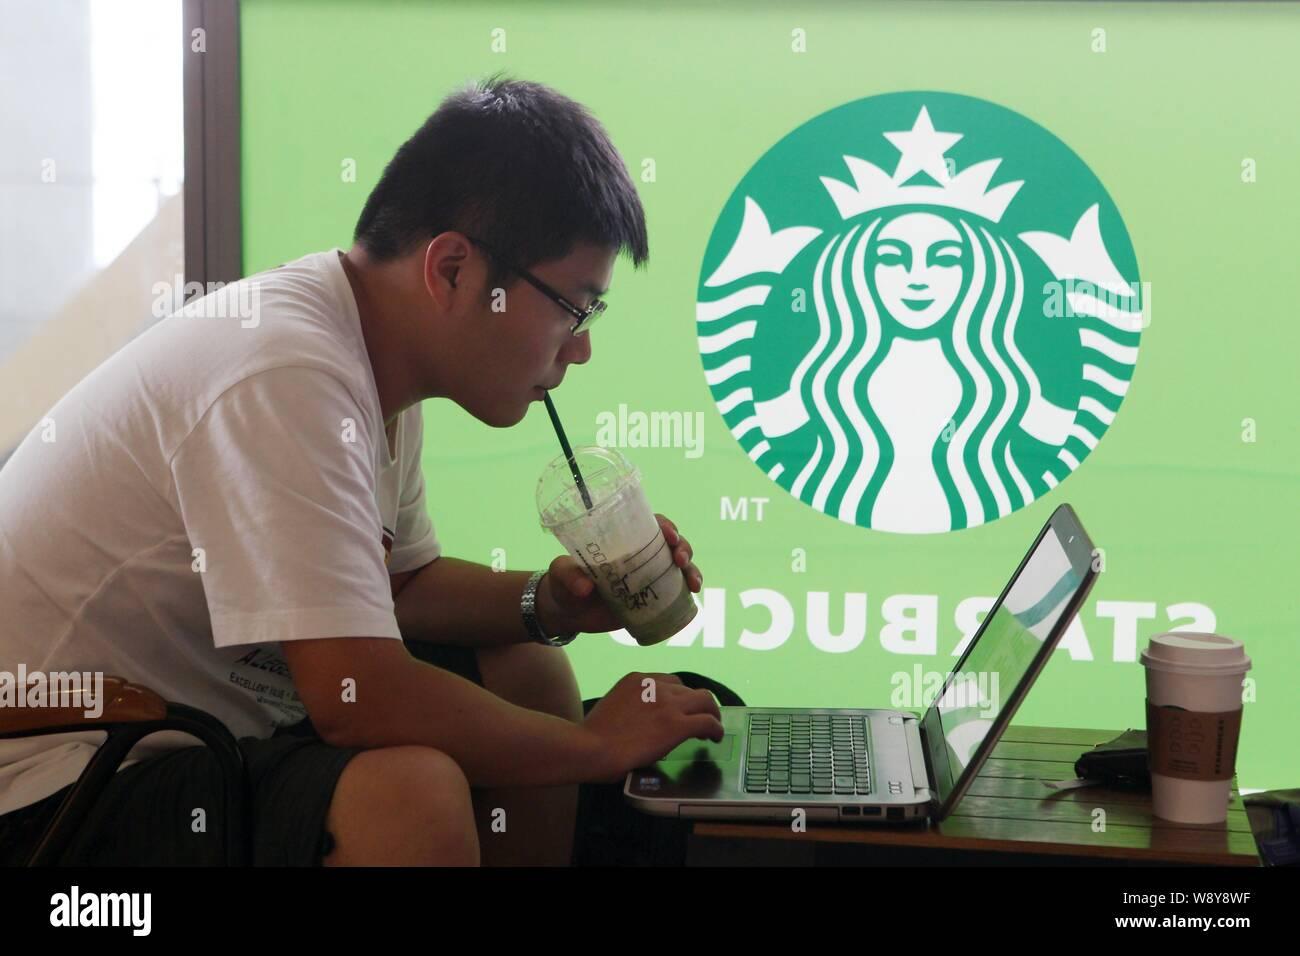 file-a-customer-drinks-coffee-as-he-uses